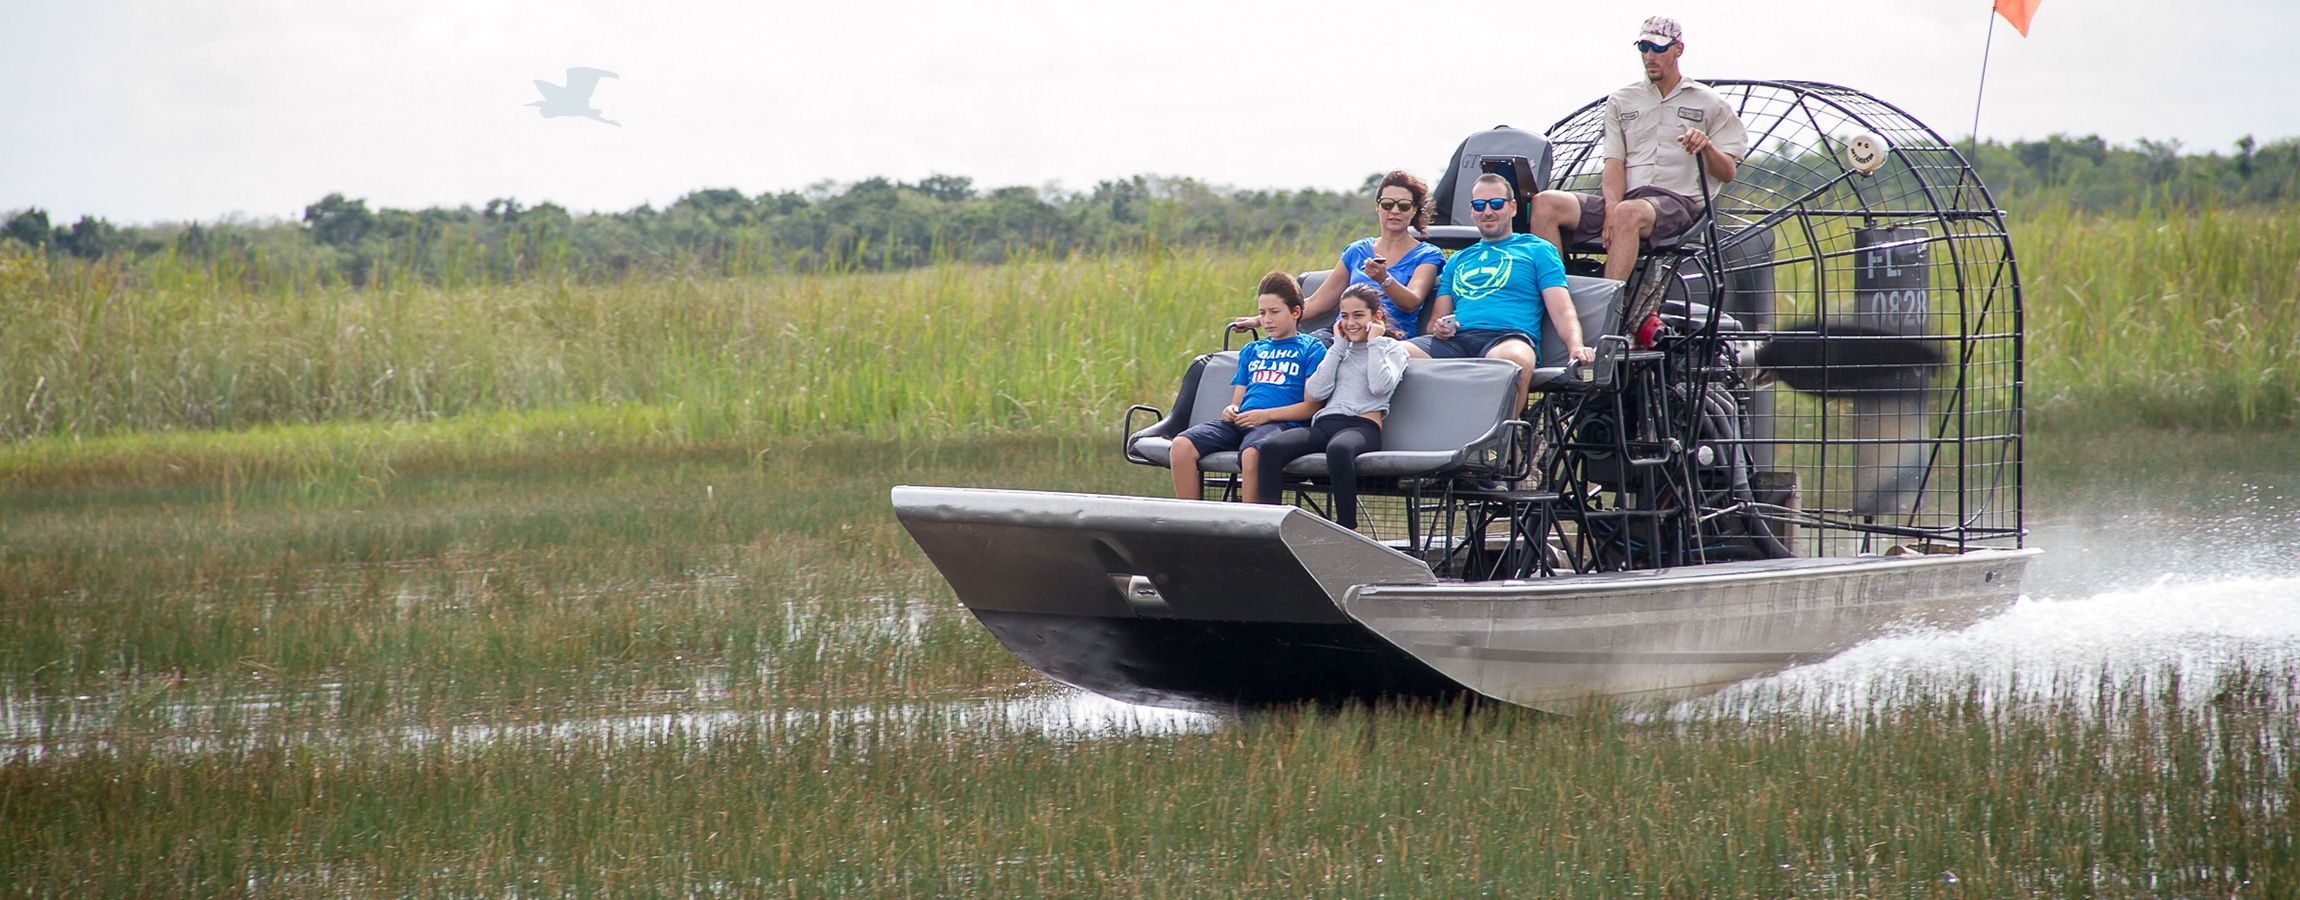 Florida Airboat Rides At Gator Park Everglades Airboat Tours Everglades Nationa Everglades Florida Everglades National Park Florida Everglades National Park